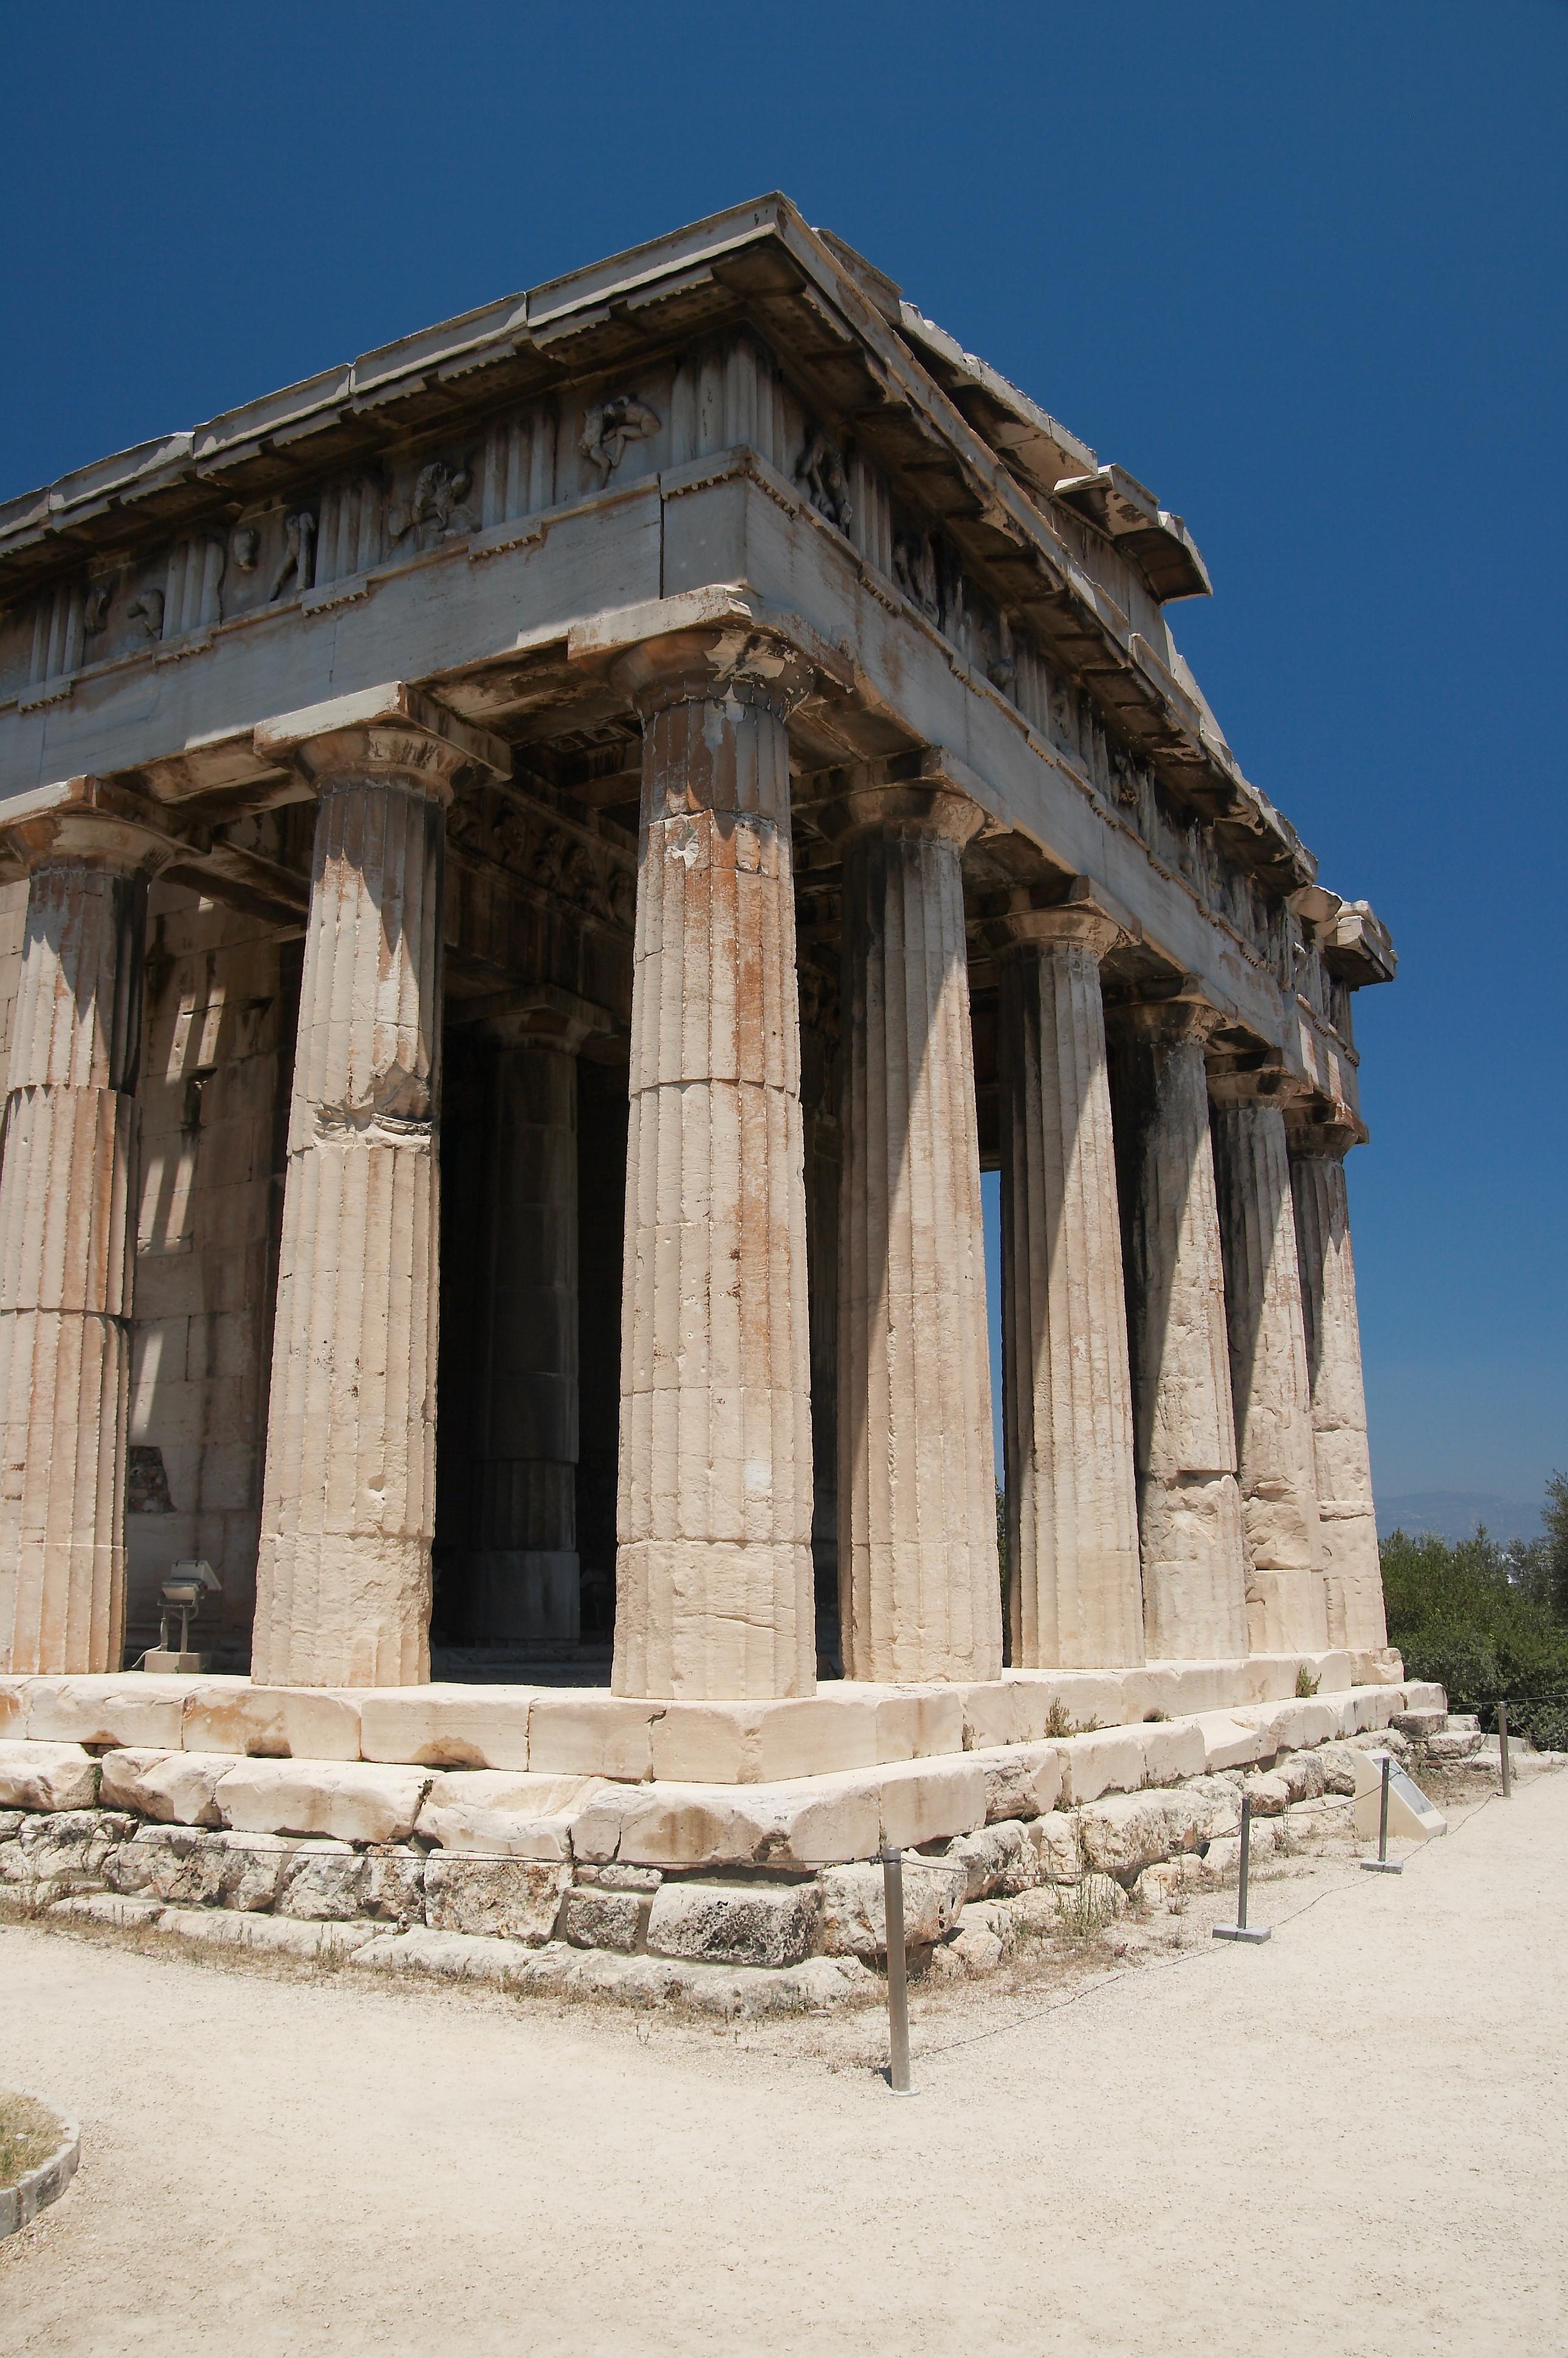 File:Temple of Hephaestus (Southwest), Athens - 20070711 ...